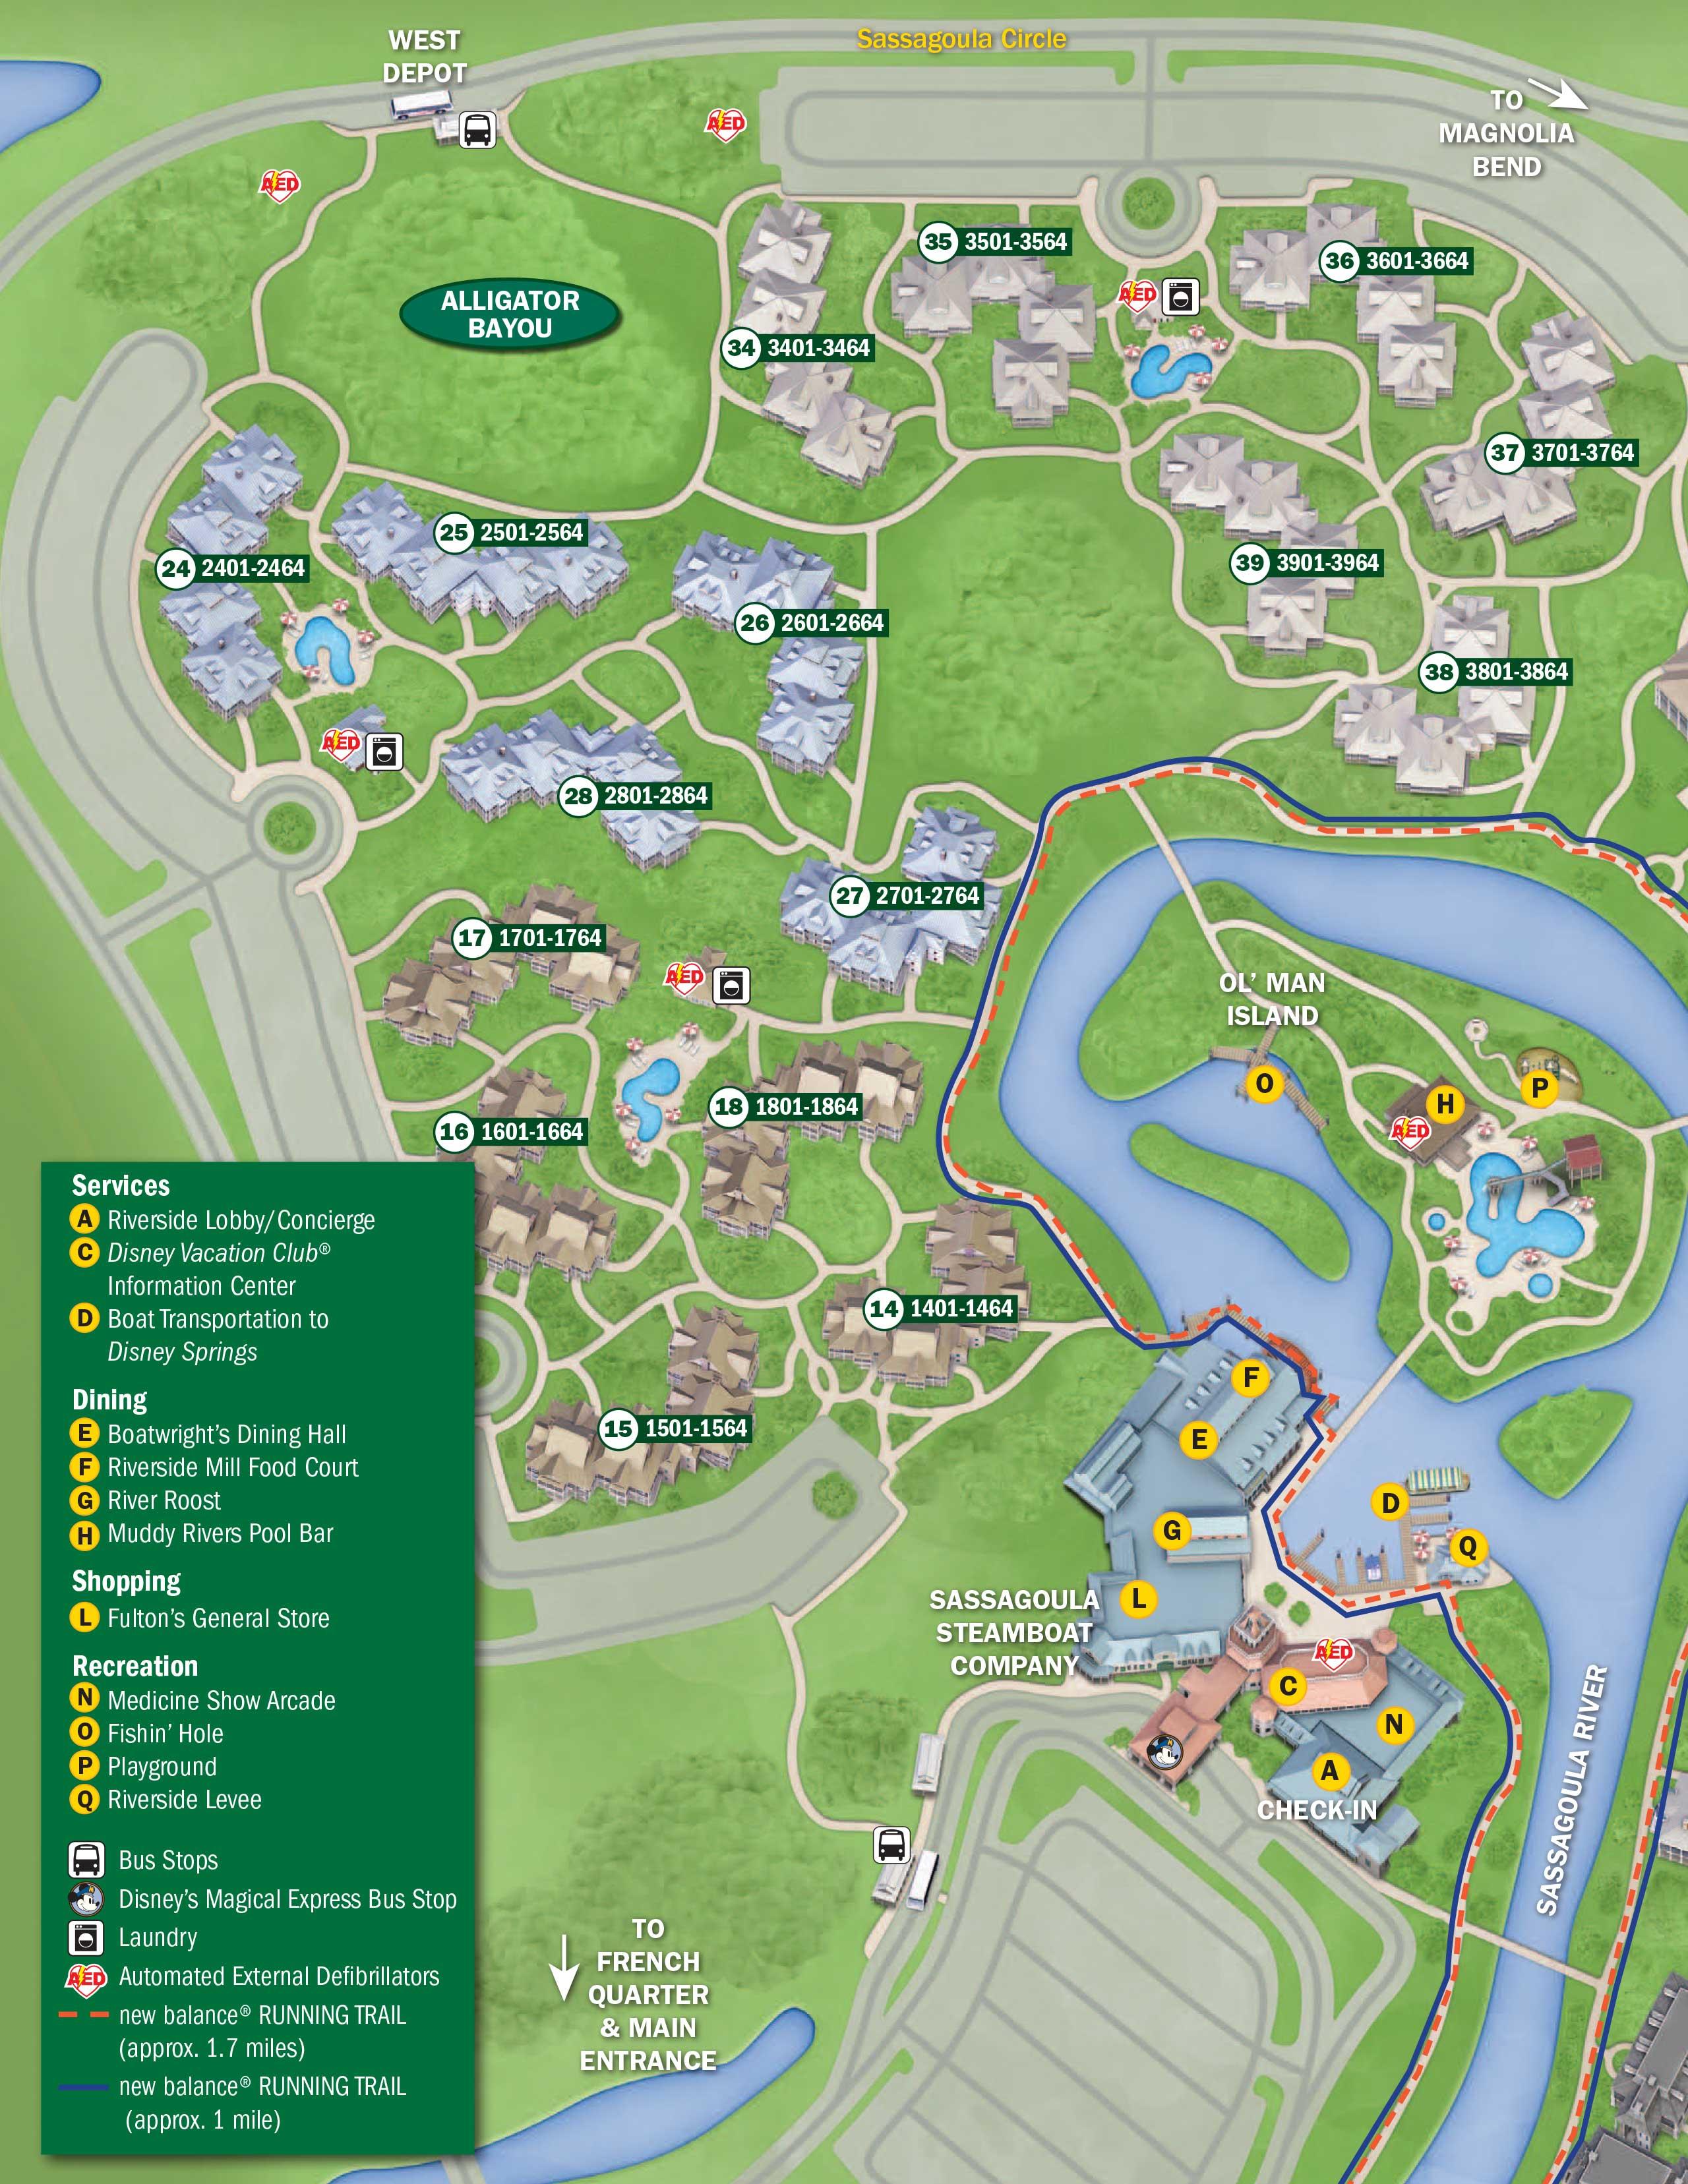 disney world restaurants map